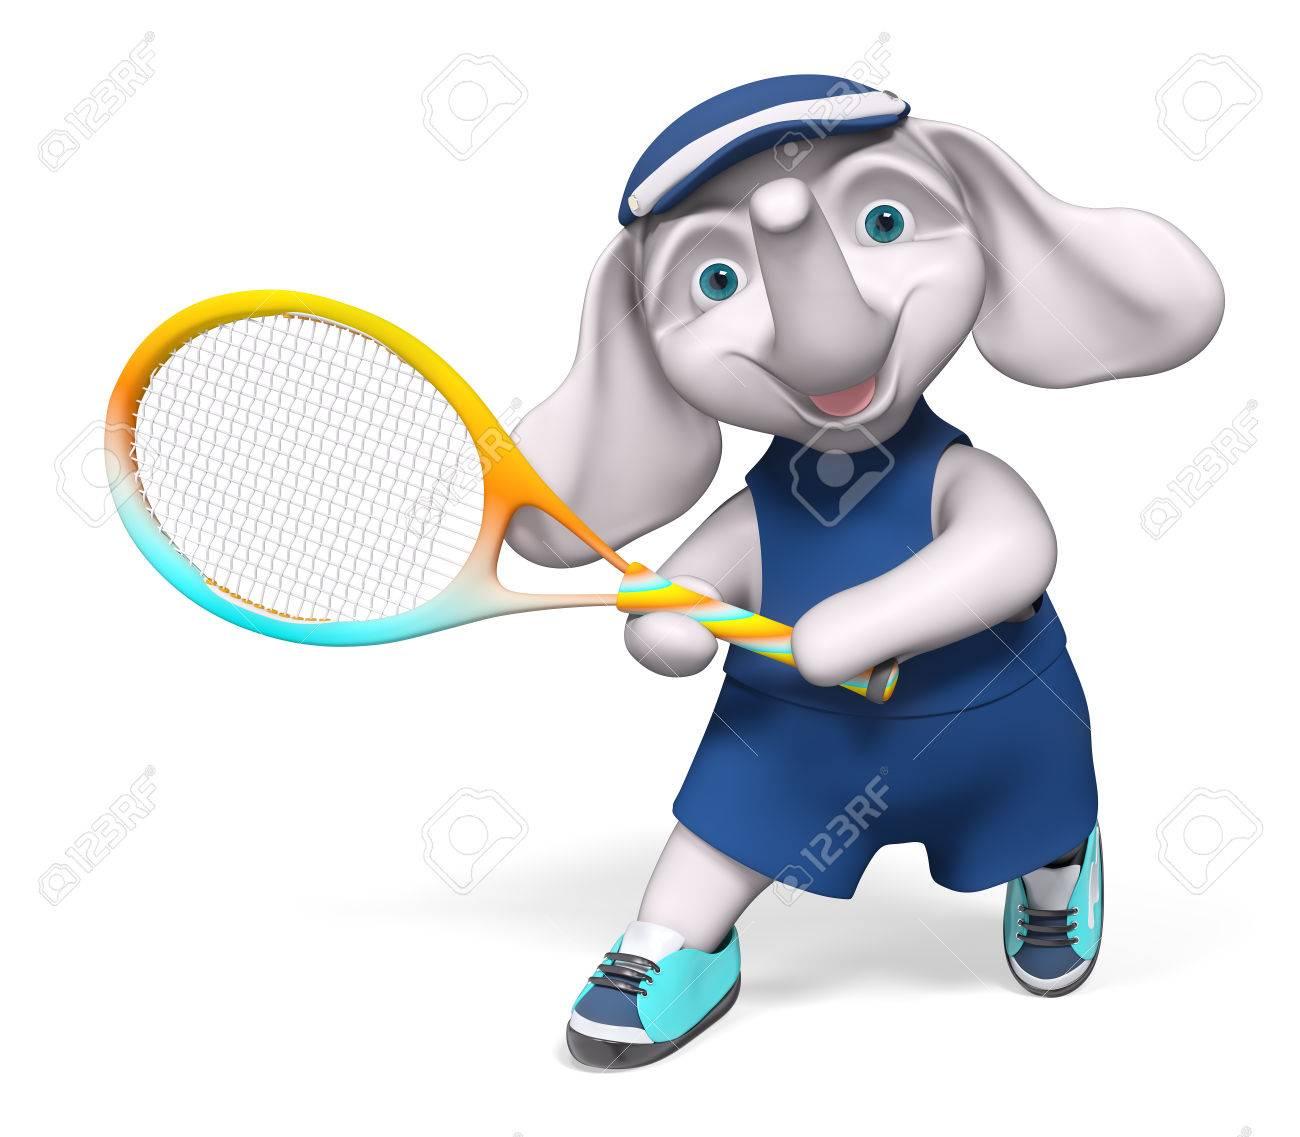 Cartoon Character Elephant Holding Tennis Racket 3d Rendering